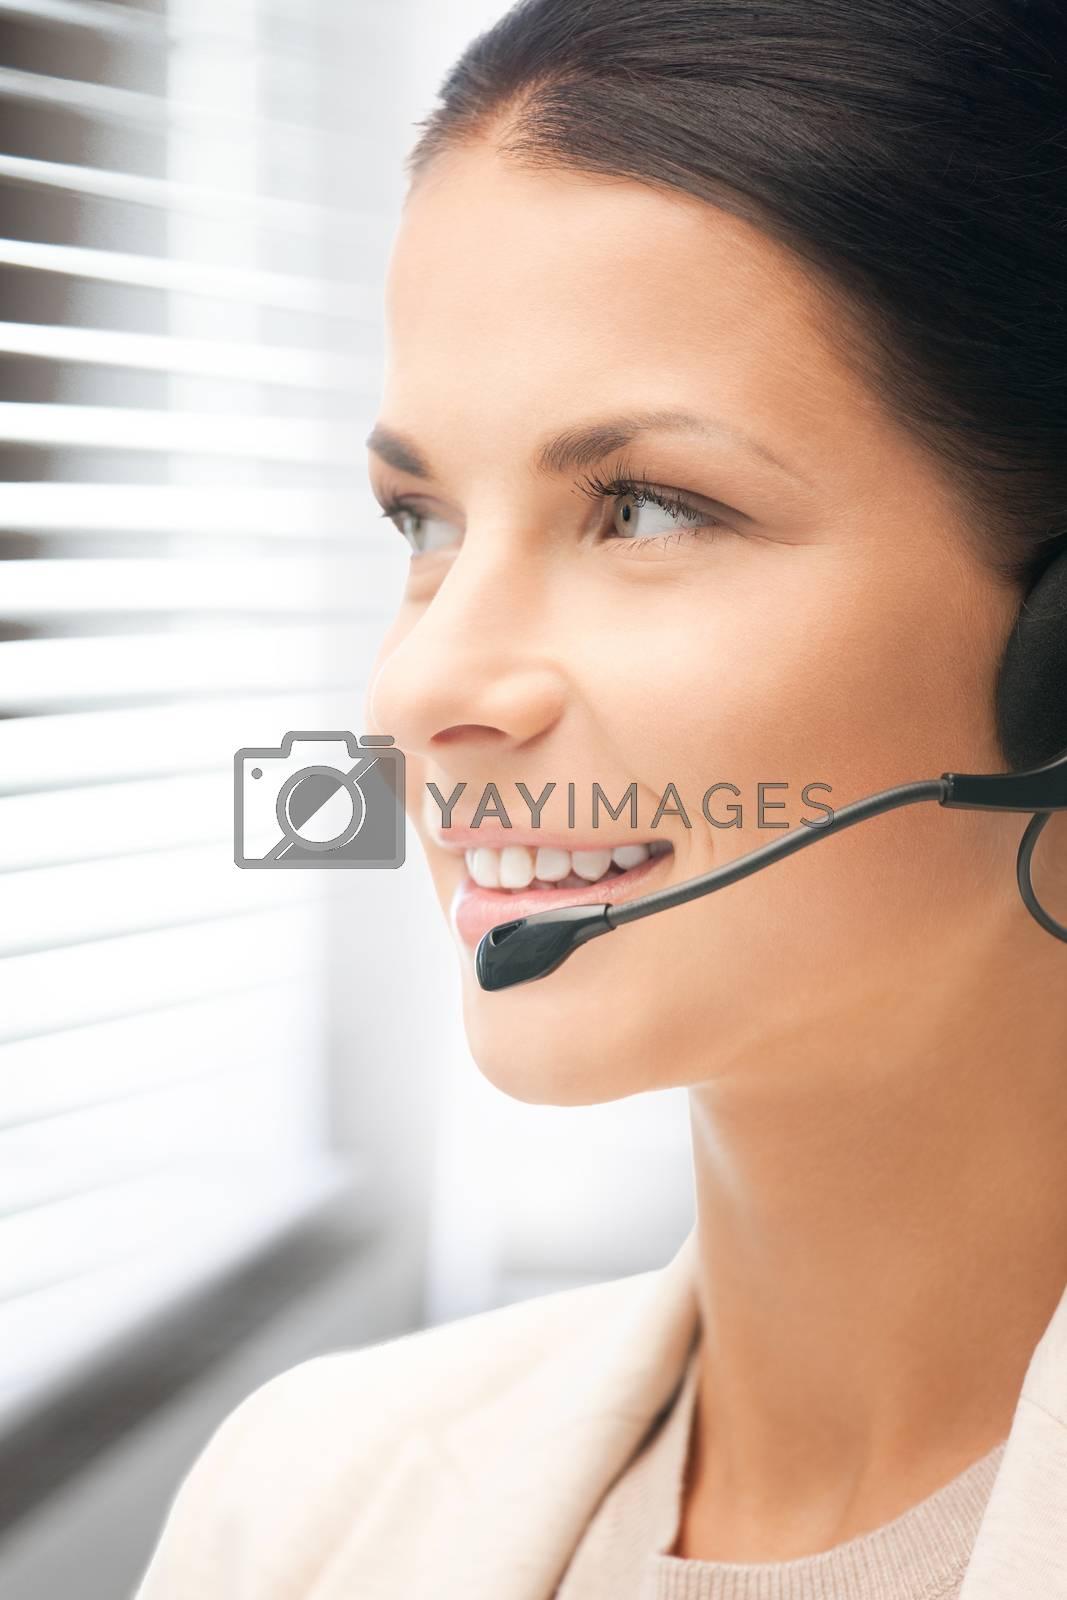 helpline by dolgachov